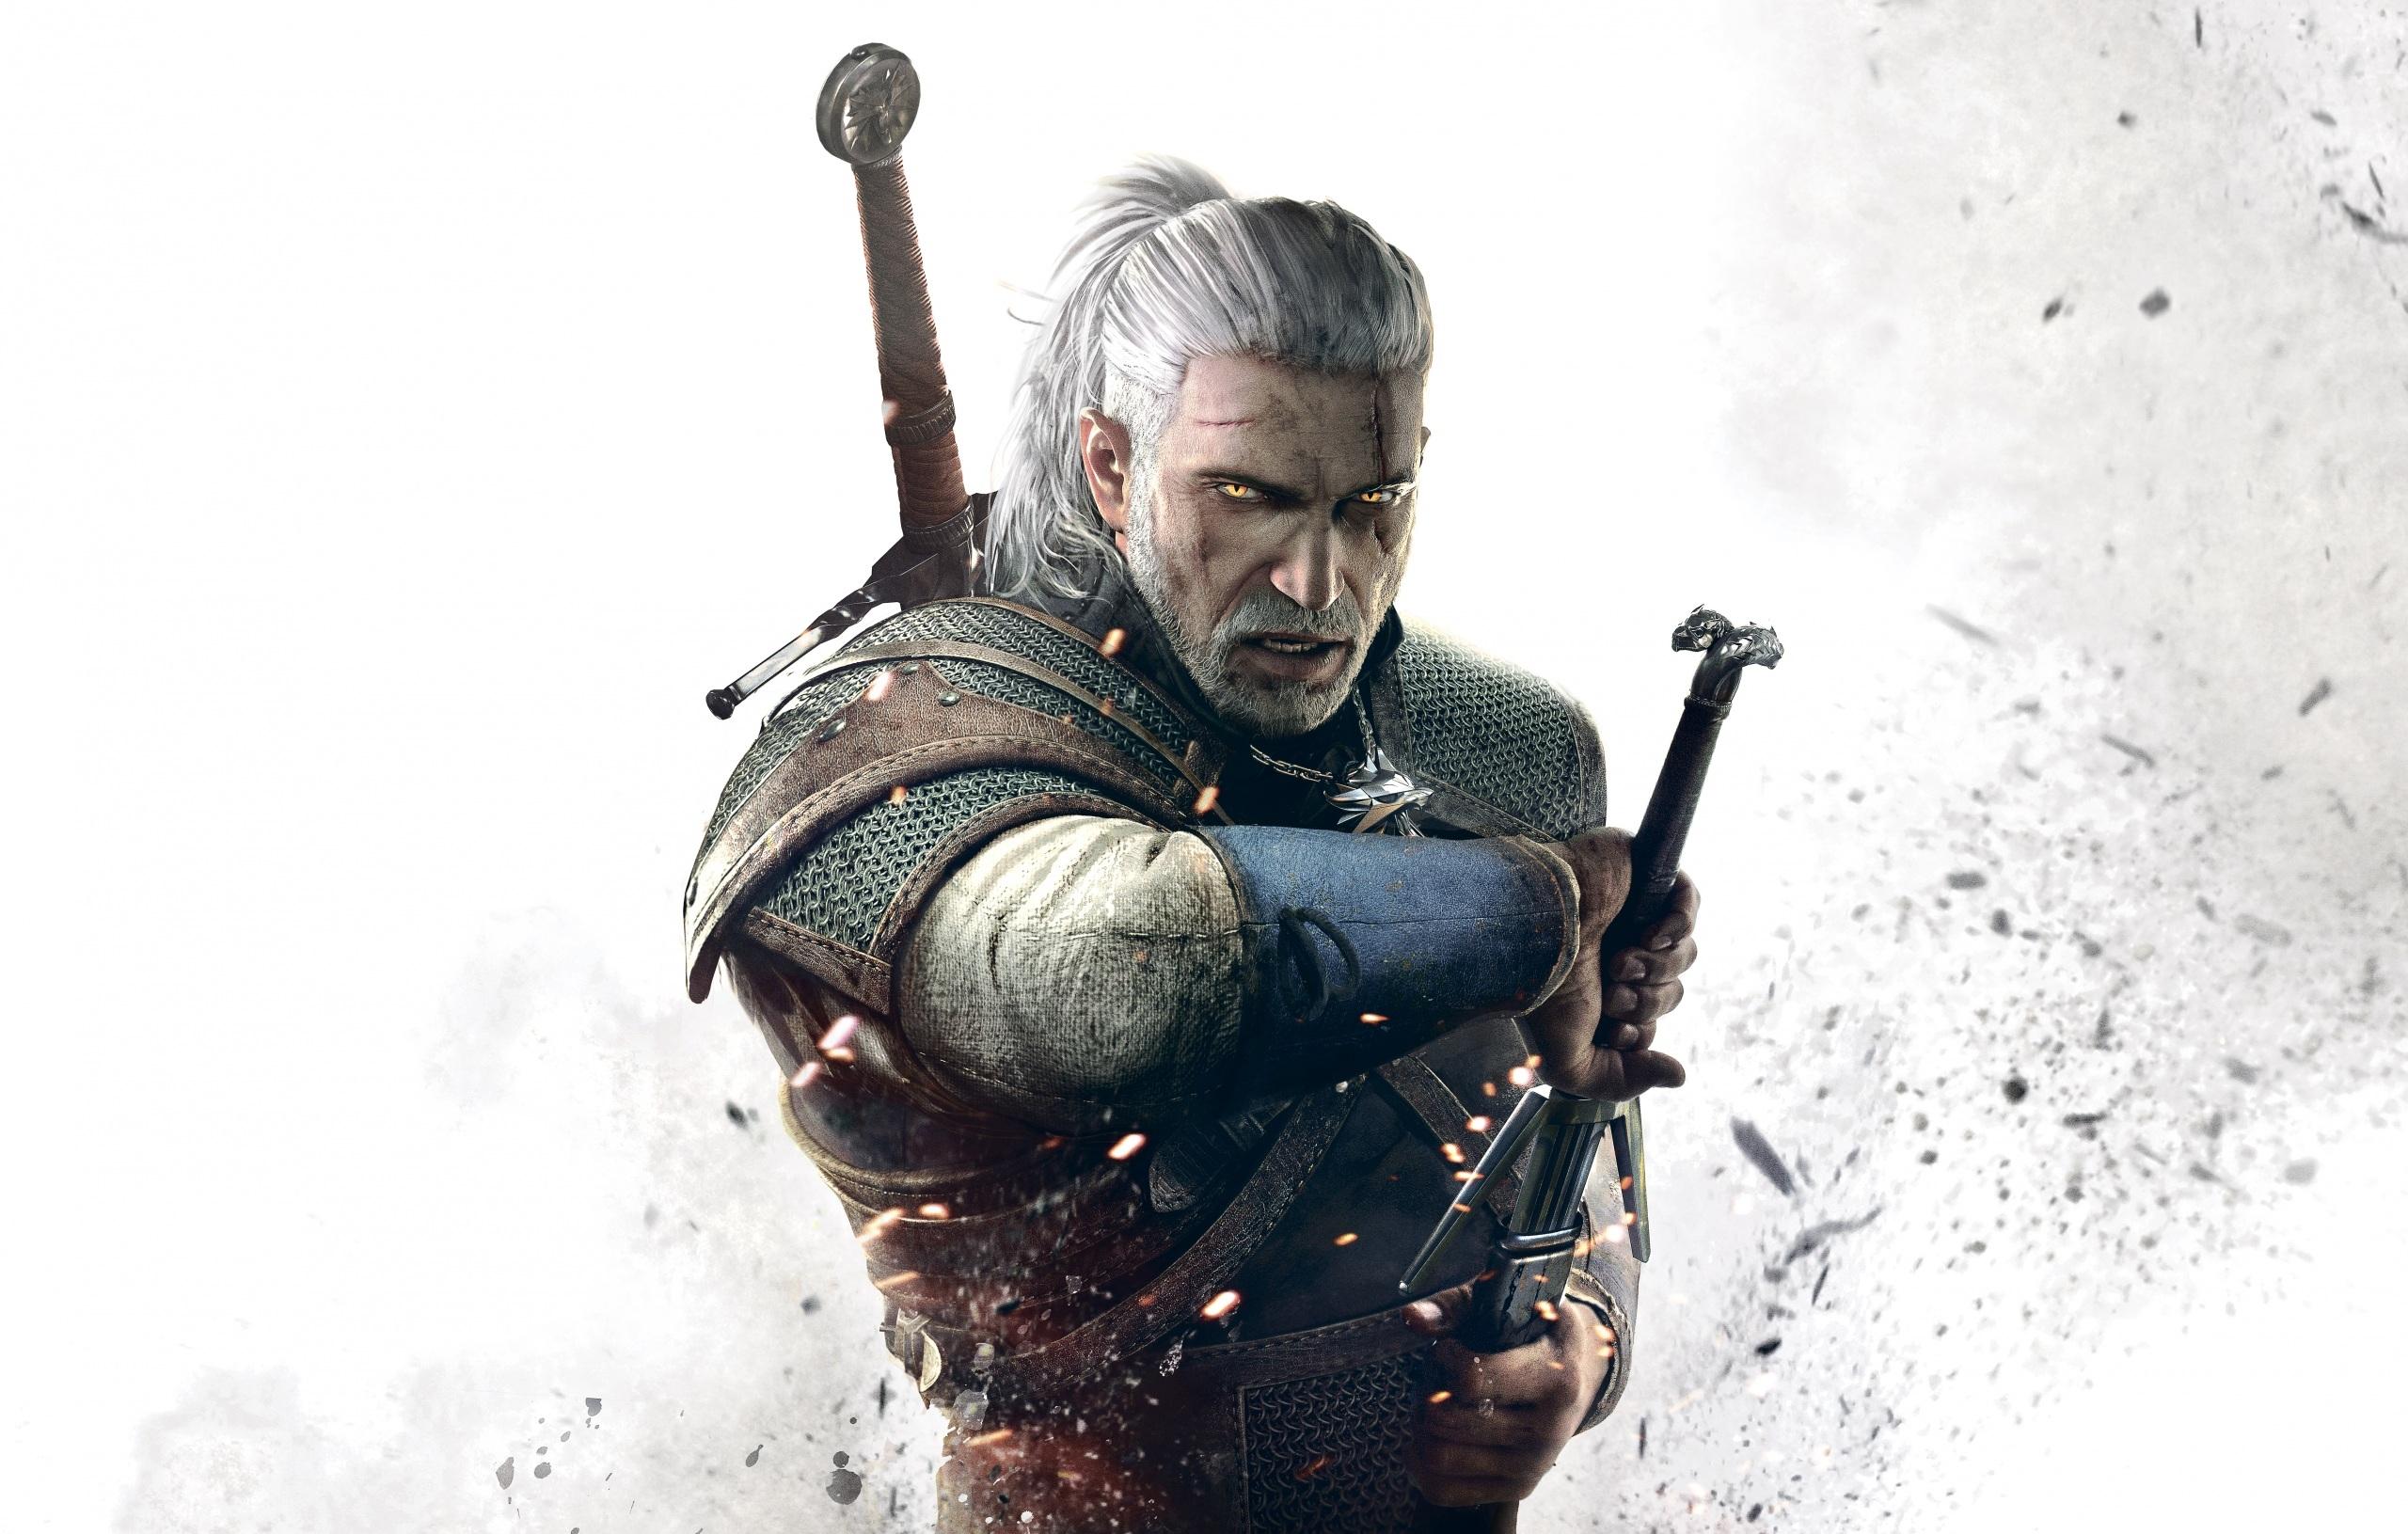 Geralt Of Rivia Art Wallpaper Hd Games 4k Wallpapers